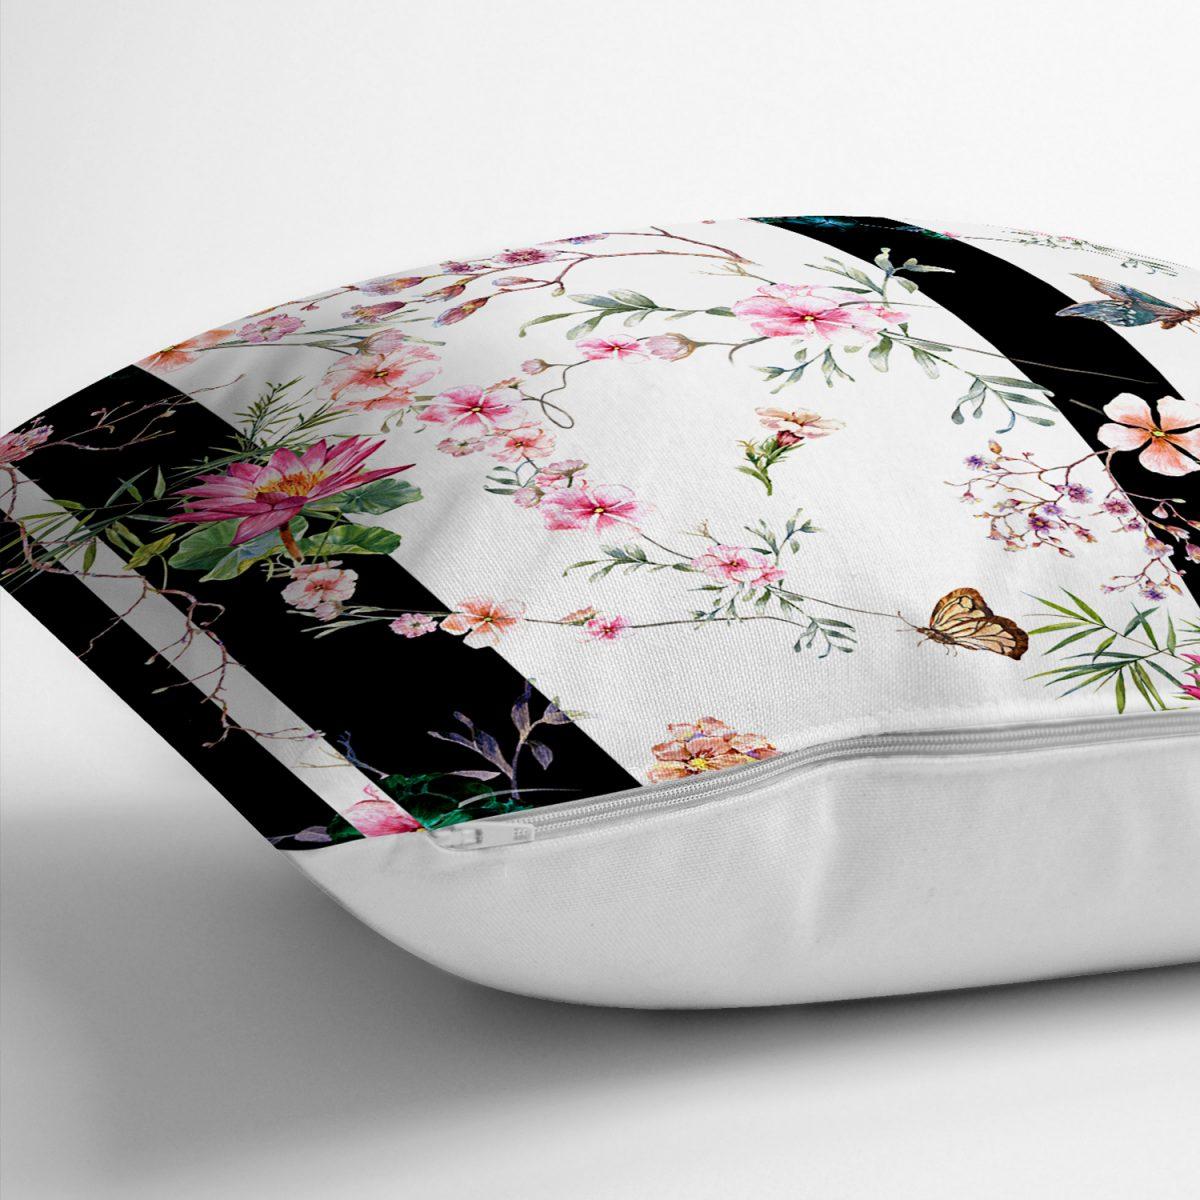 Realhomes Mıda Summer Özel Serisi Dijital Baskılı Modern Yastık Kırlent Kılıfı Realhomes